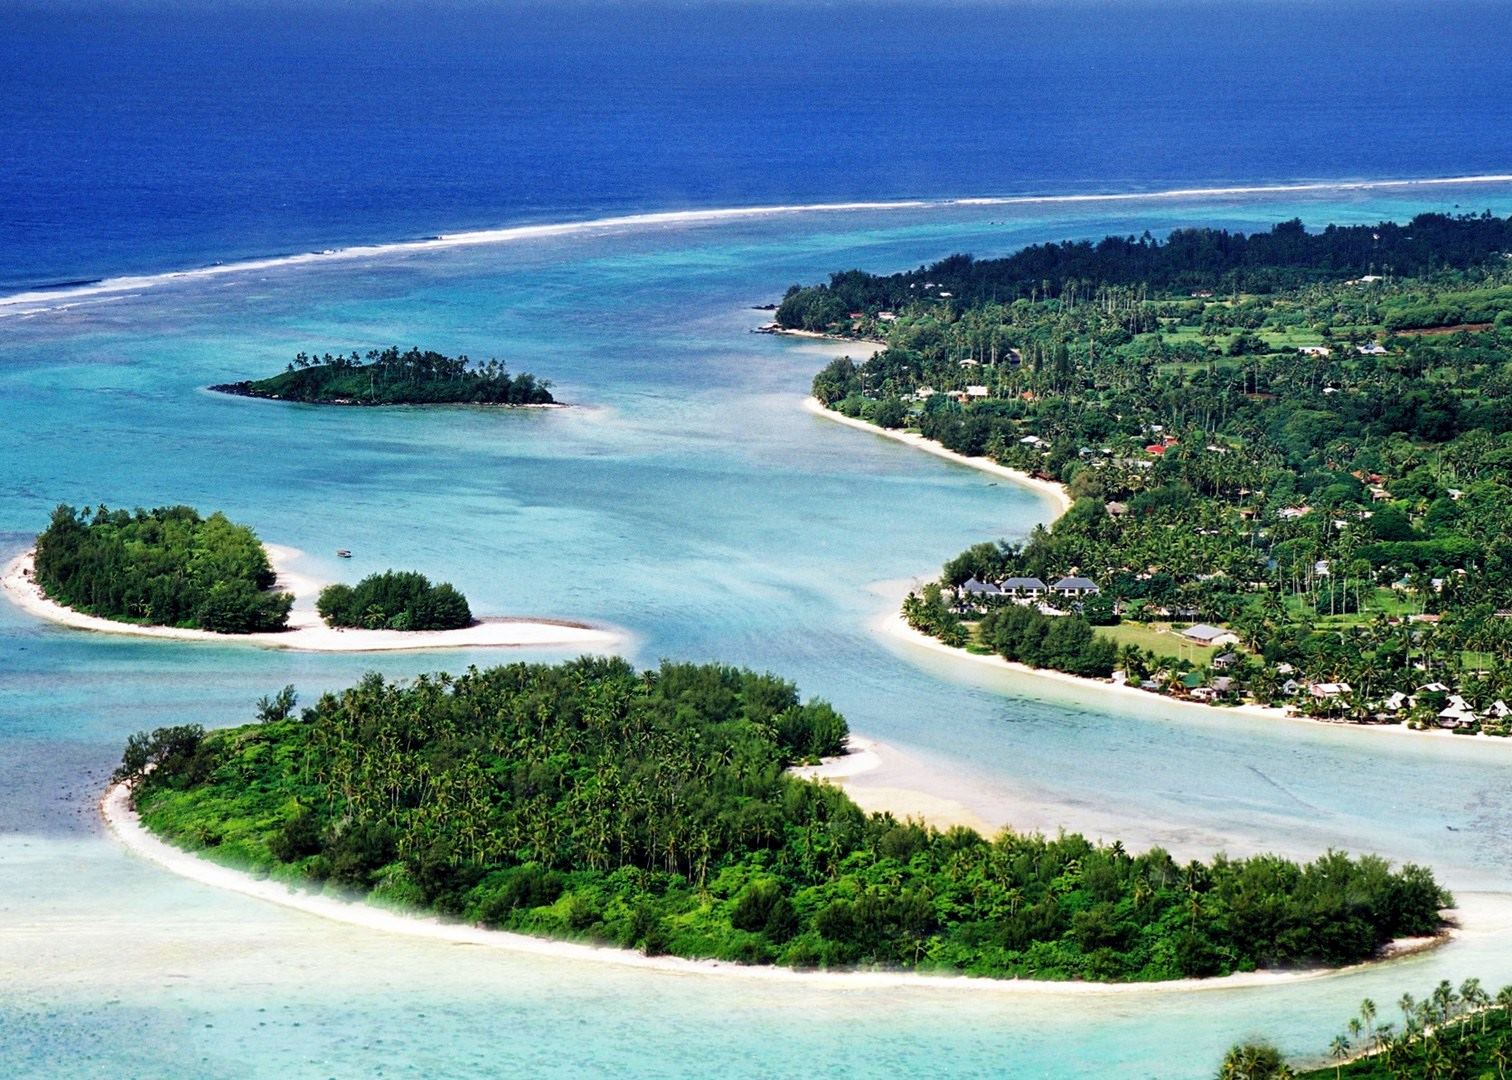 Картинки по запросу rarotonga island